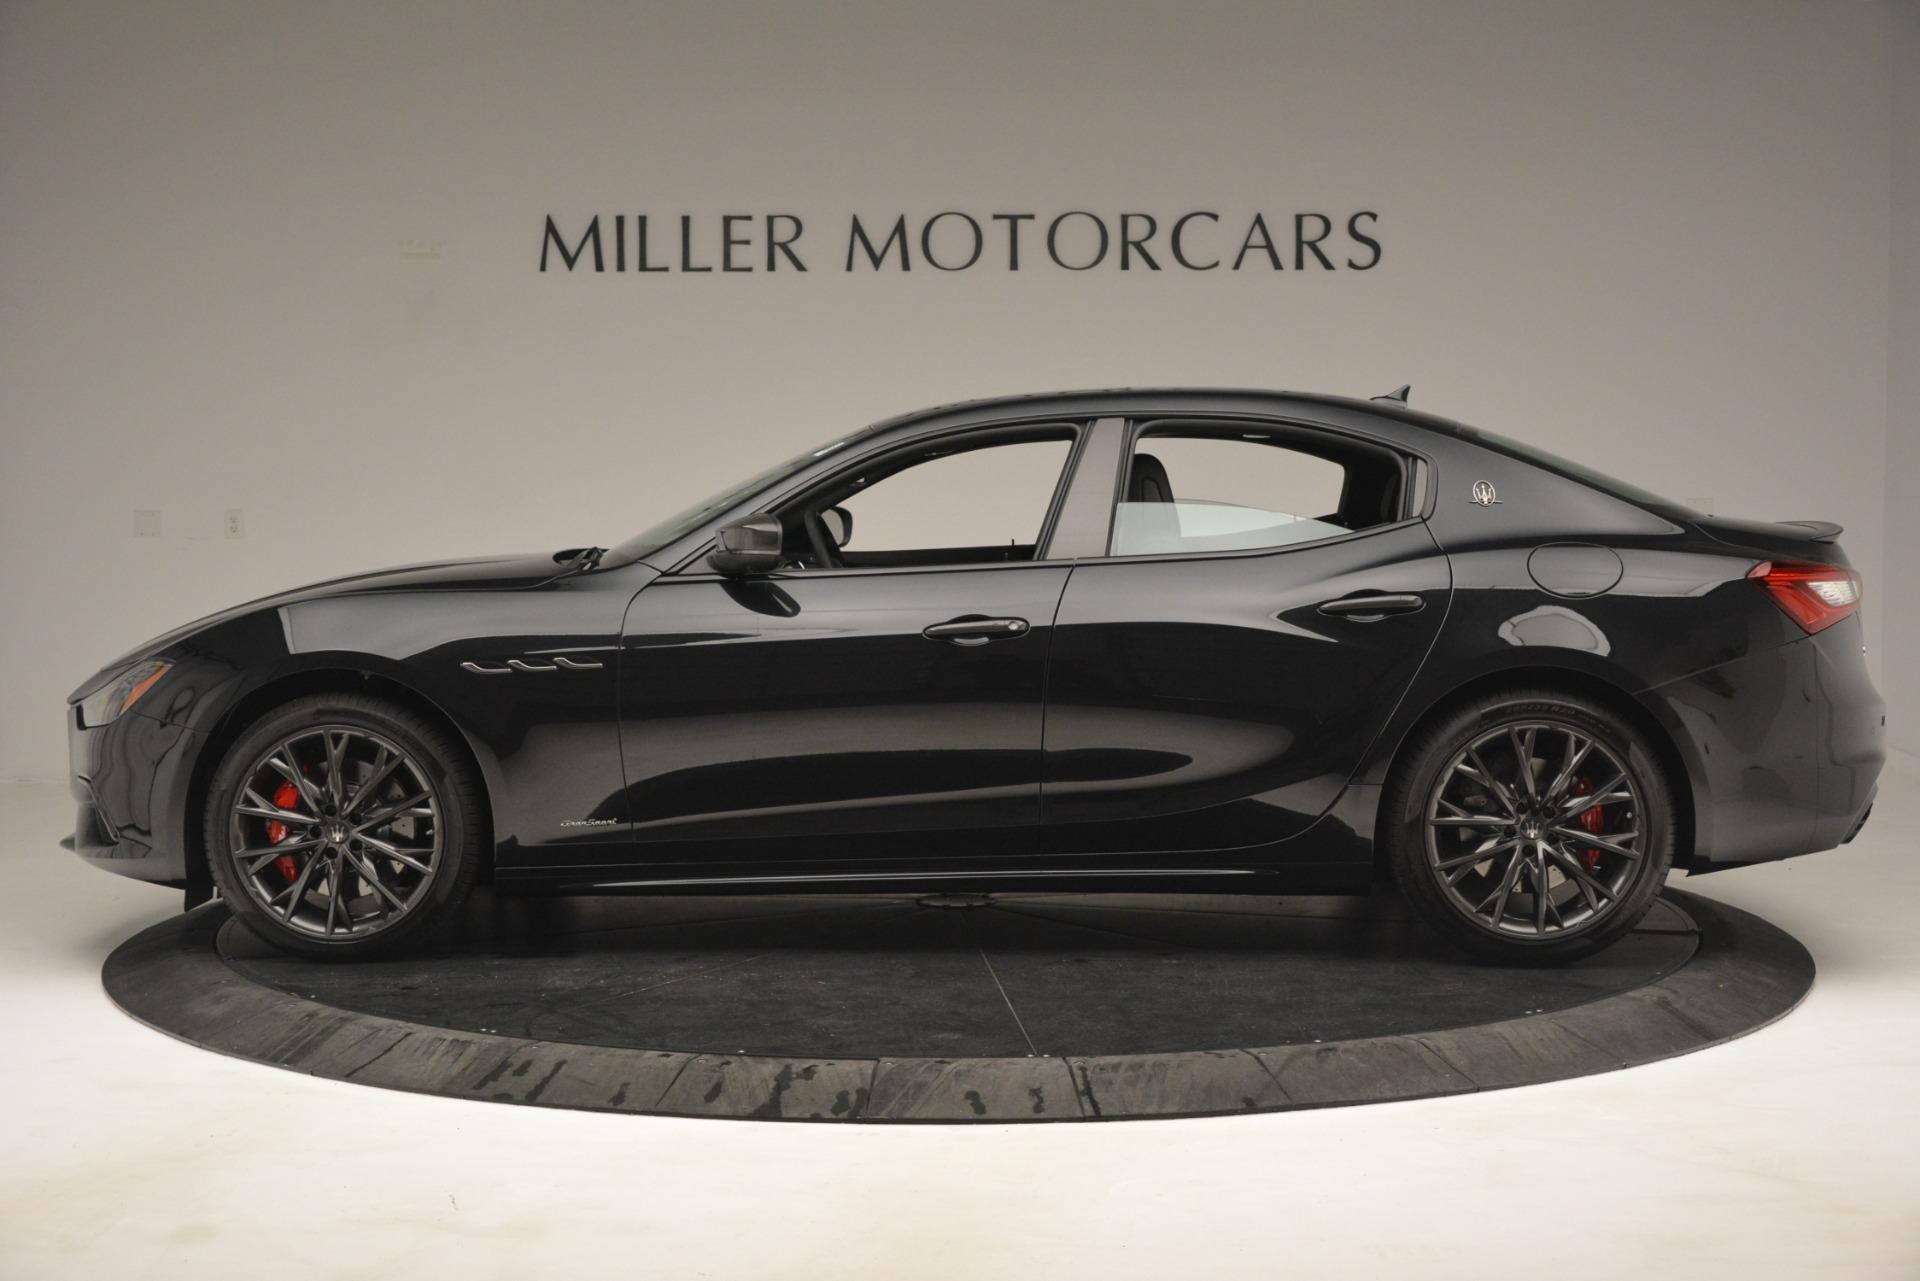 New 2019 Maserati Ghibli S Q4 GranSport For Sale In Greenwich, CT 2926_p3